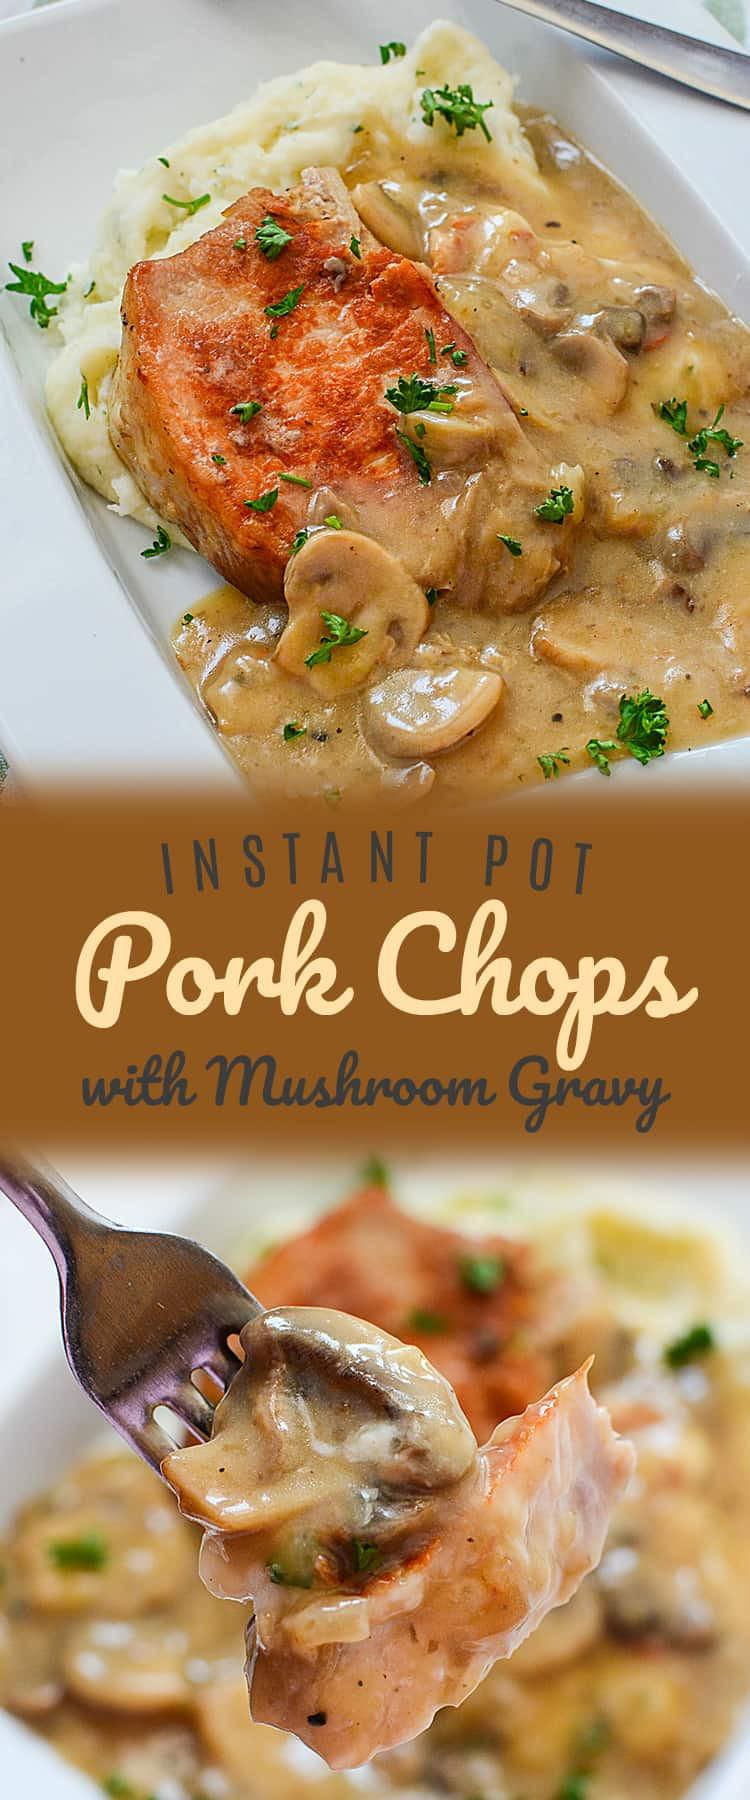 Instant Pot Boneless Pork Chops  Instant Pot Pork Chops with Mushroom Gravy